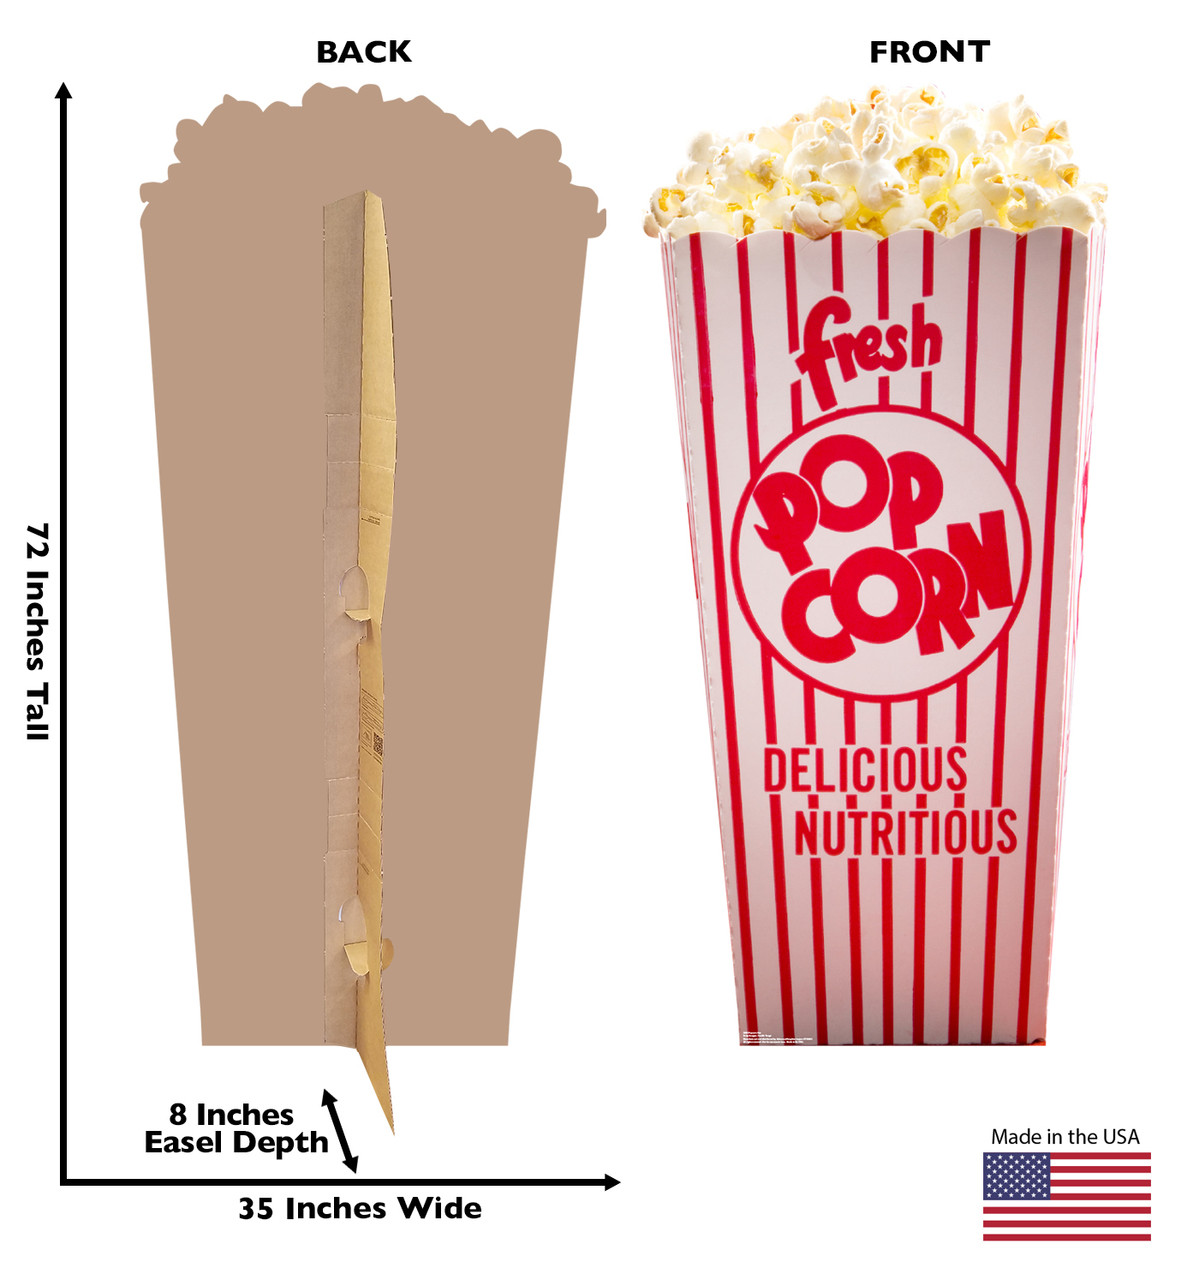 Popcorn Box - Cardboard Cutout